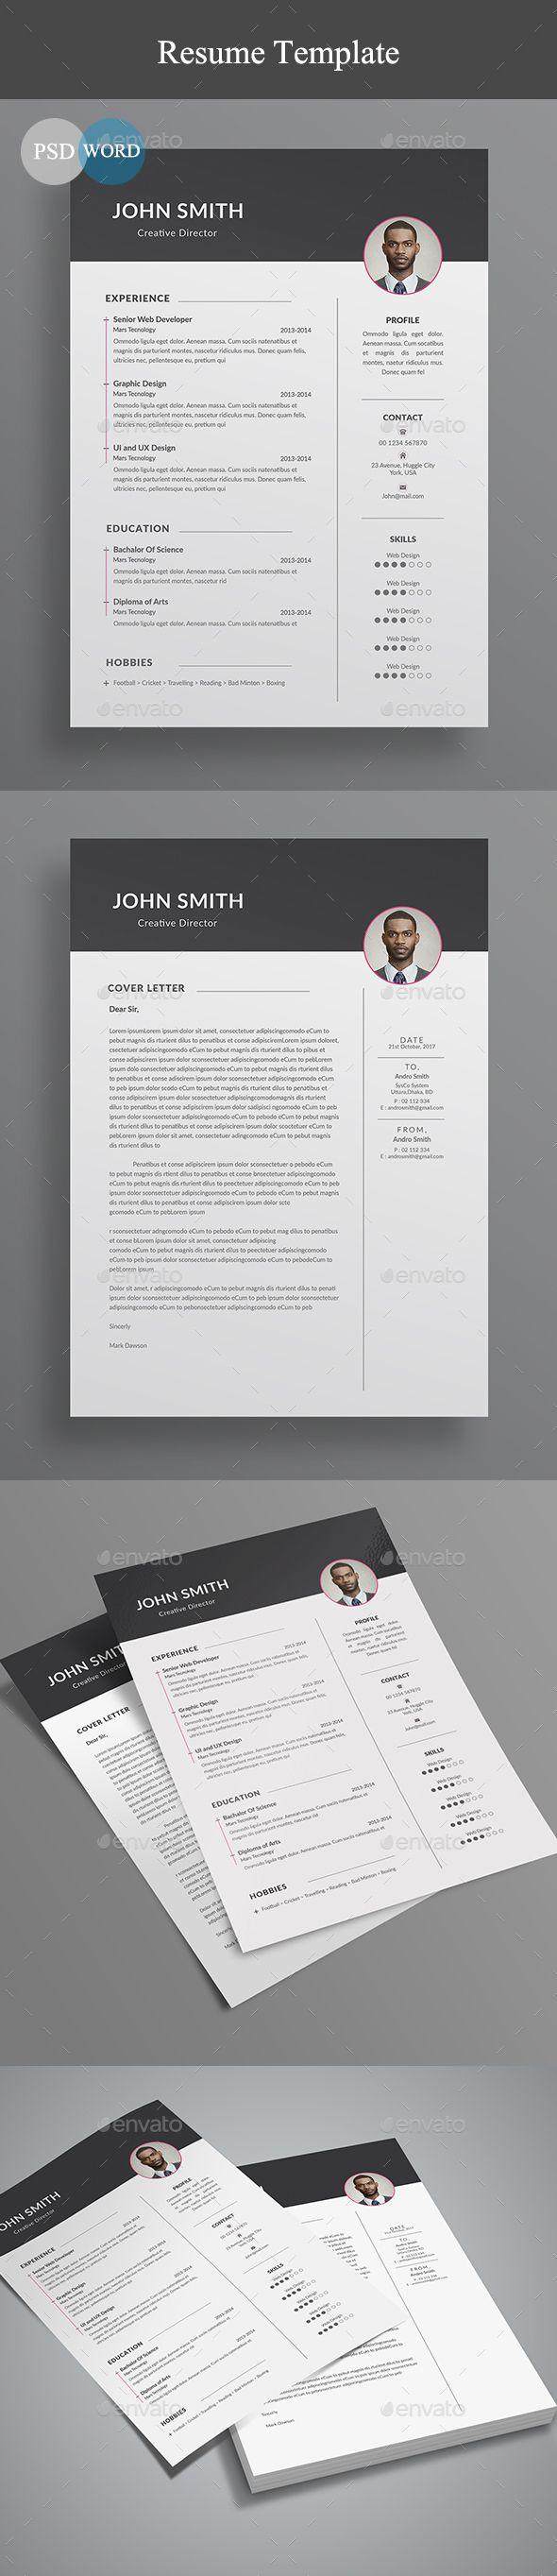 Resume by linzo91 Letterhead8.27脳11.69 with 0.25鈥?20bleeds PSD